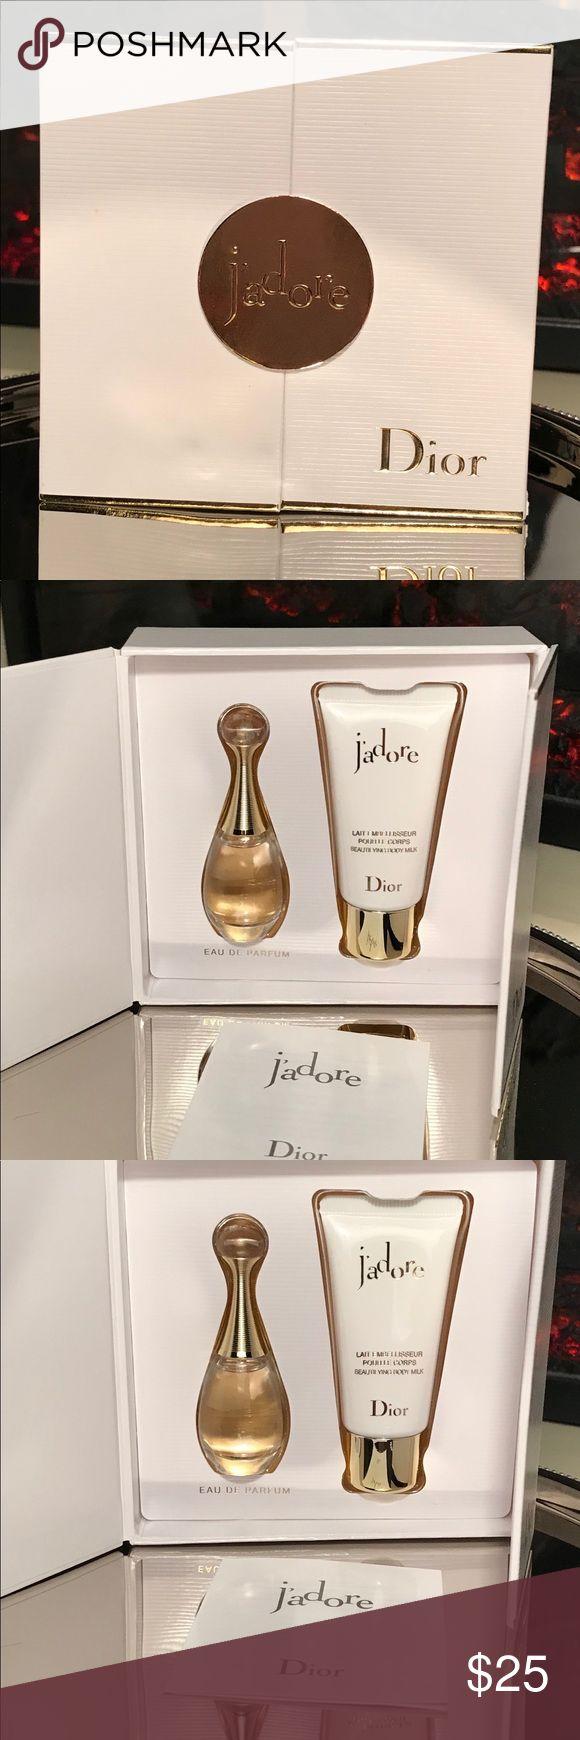 Jadore Eau de parfum & body milk. Jadore .5 ml eau de Perfume & 20ml Body milk. Christian Dior Makeup